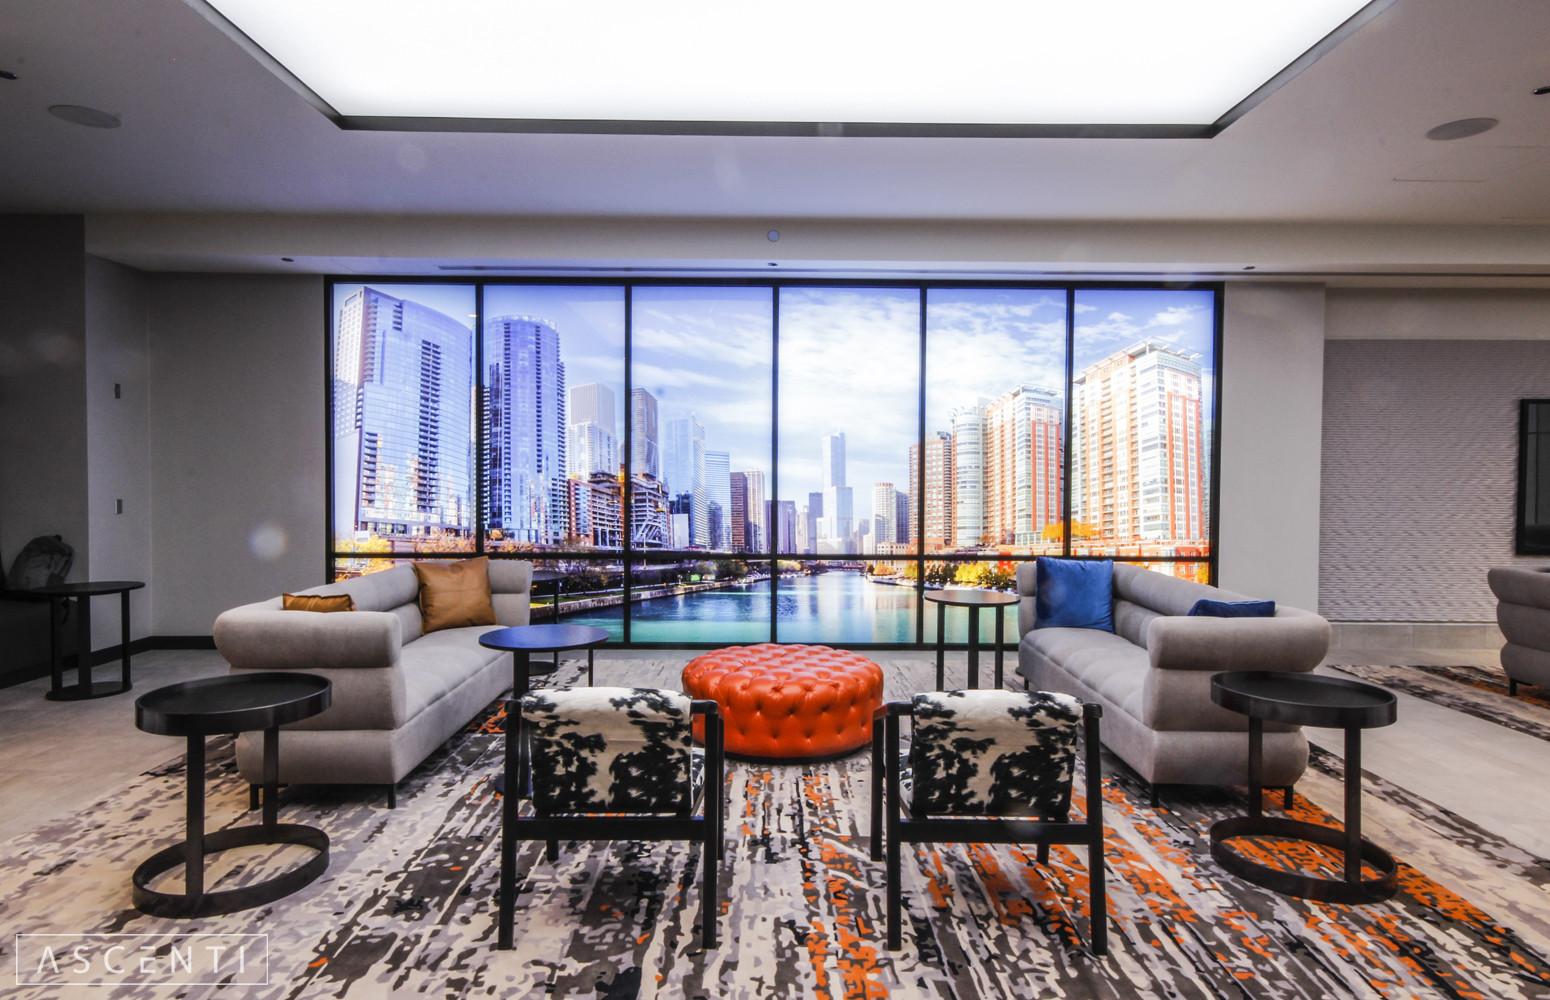 Hotel_Chicago_3wm_ascenti_lighting.jpg